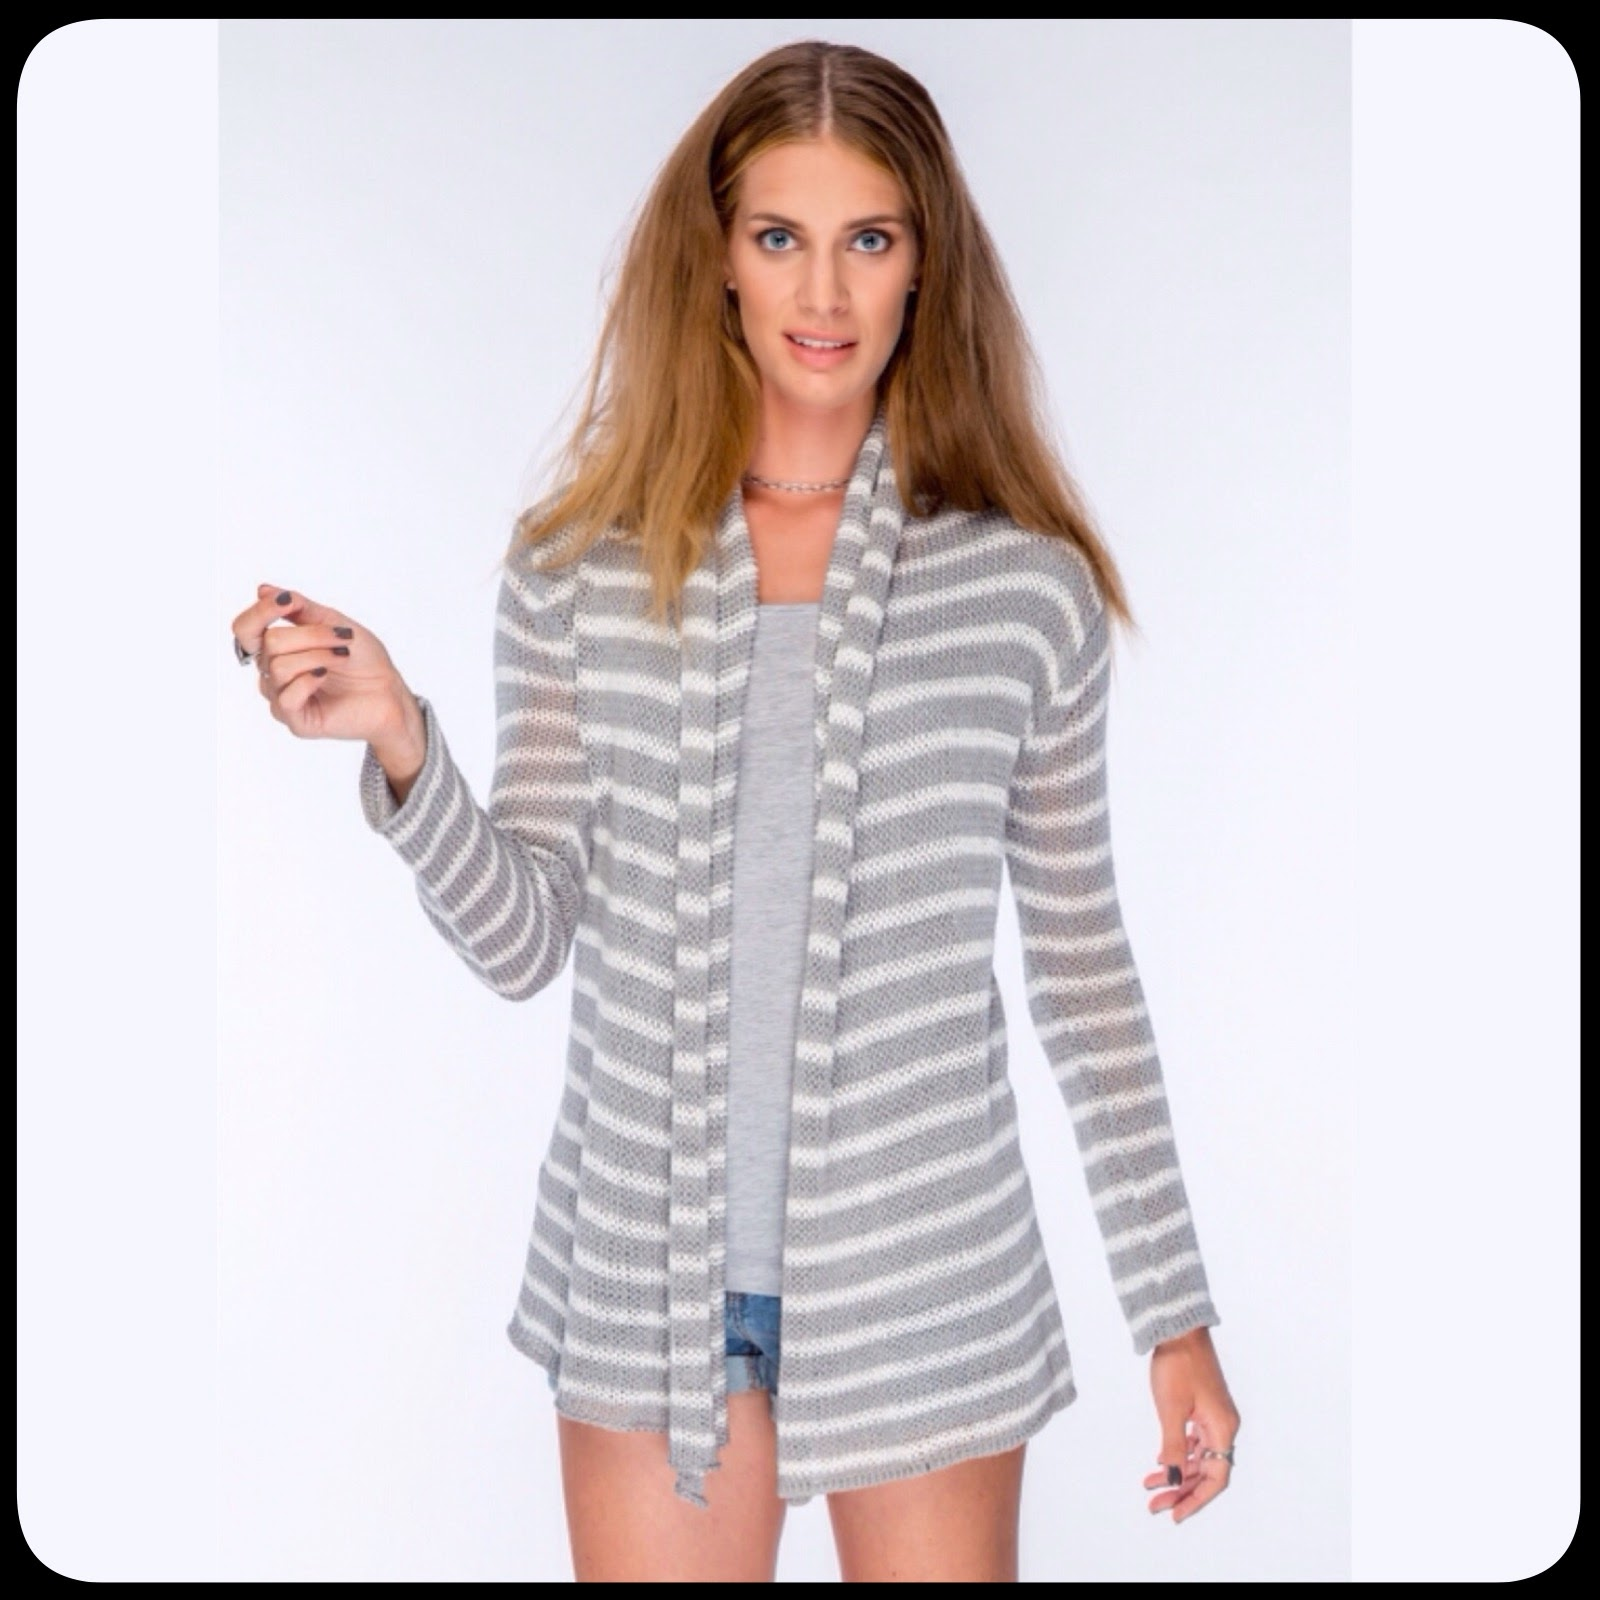 https://squareup.com/market/wholly-tara/wooden-ships-cotton-striped-wrap-cardigan